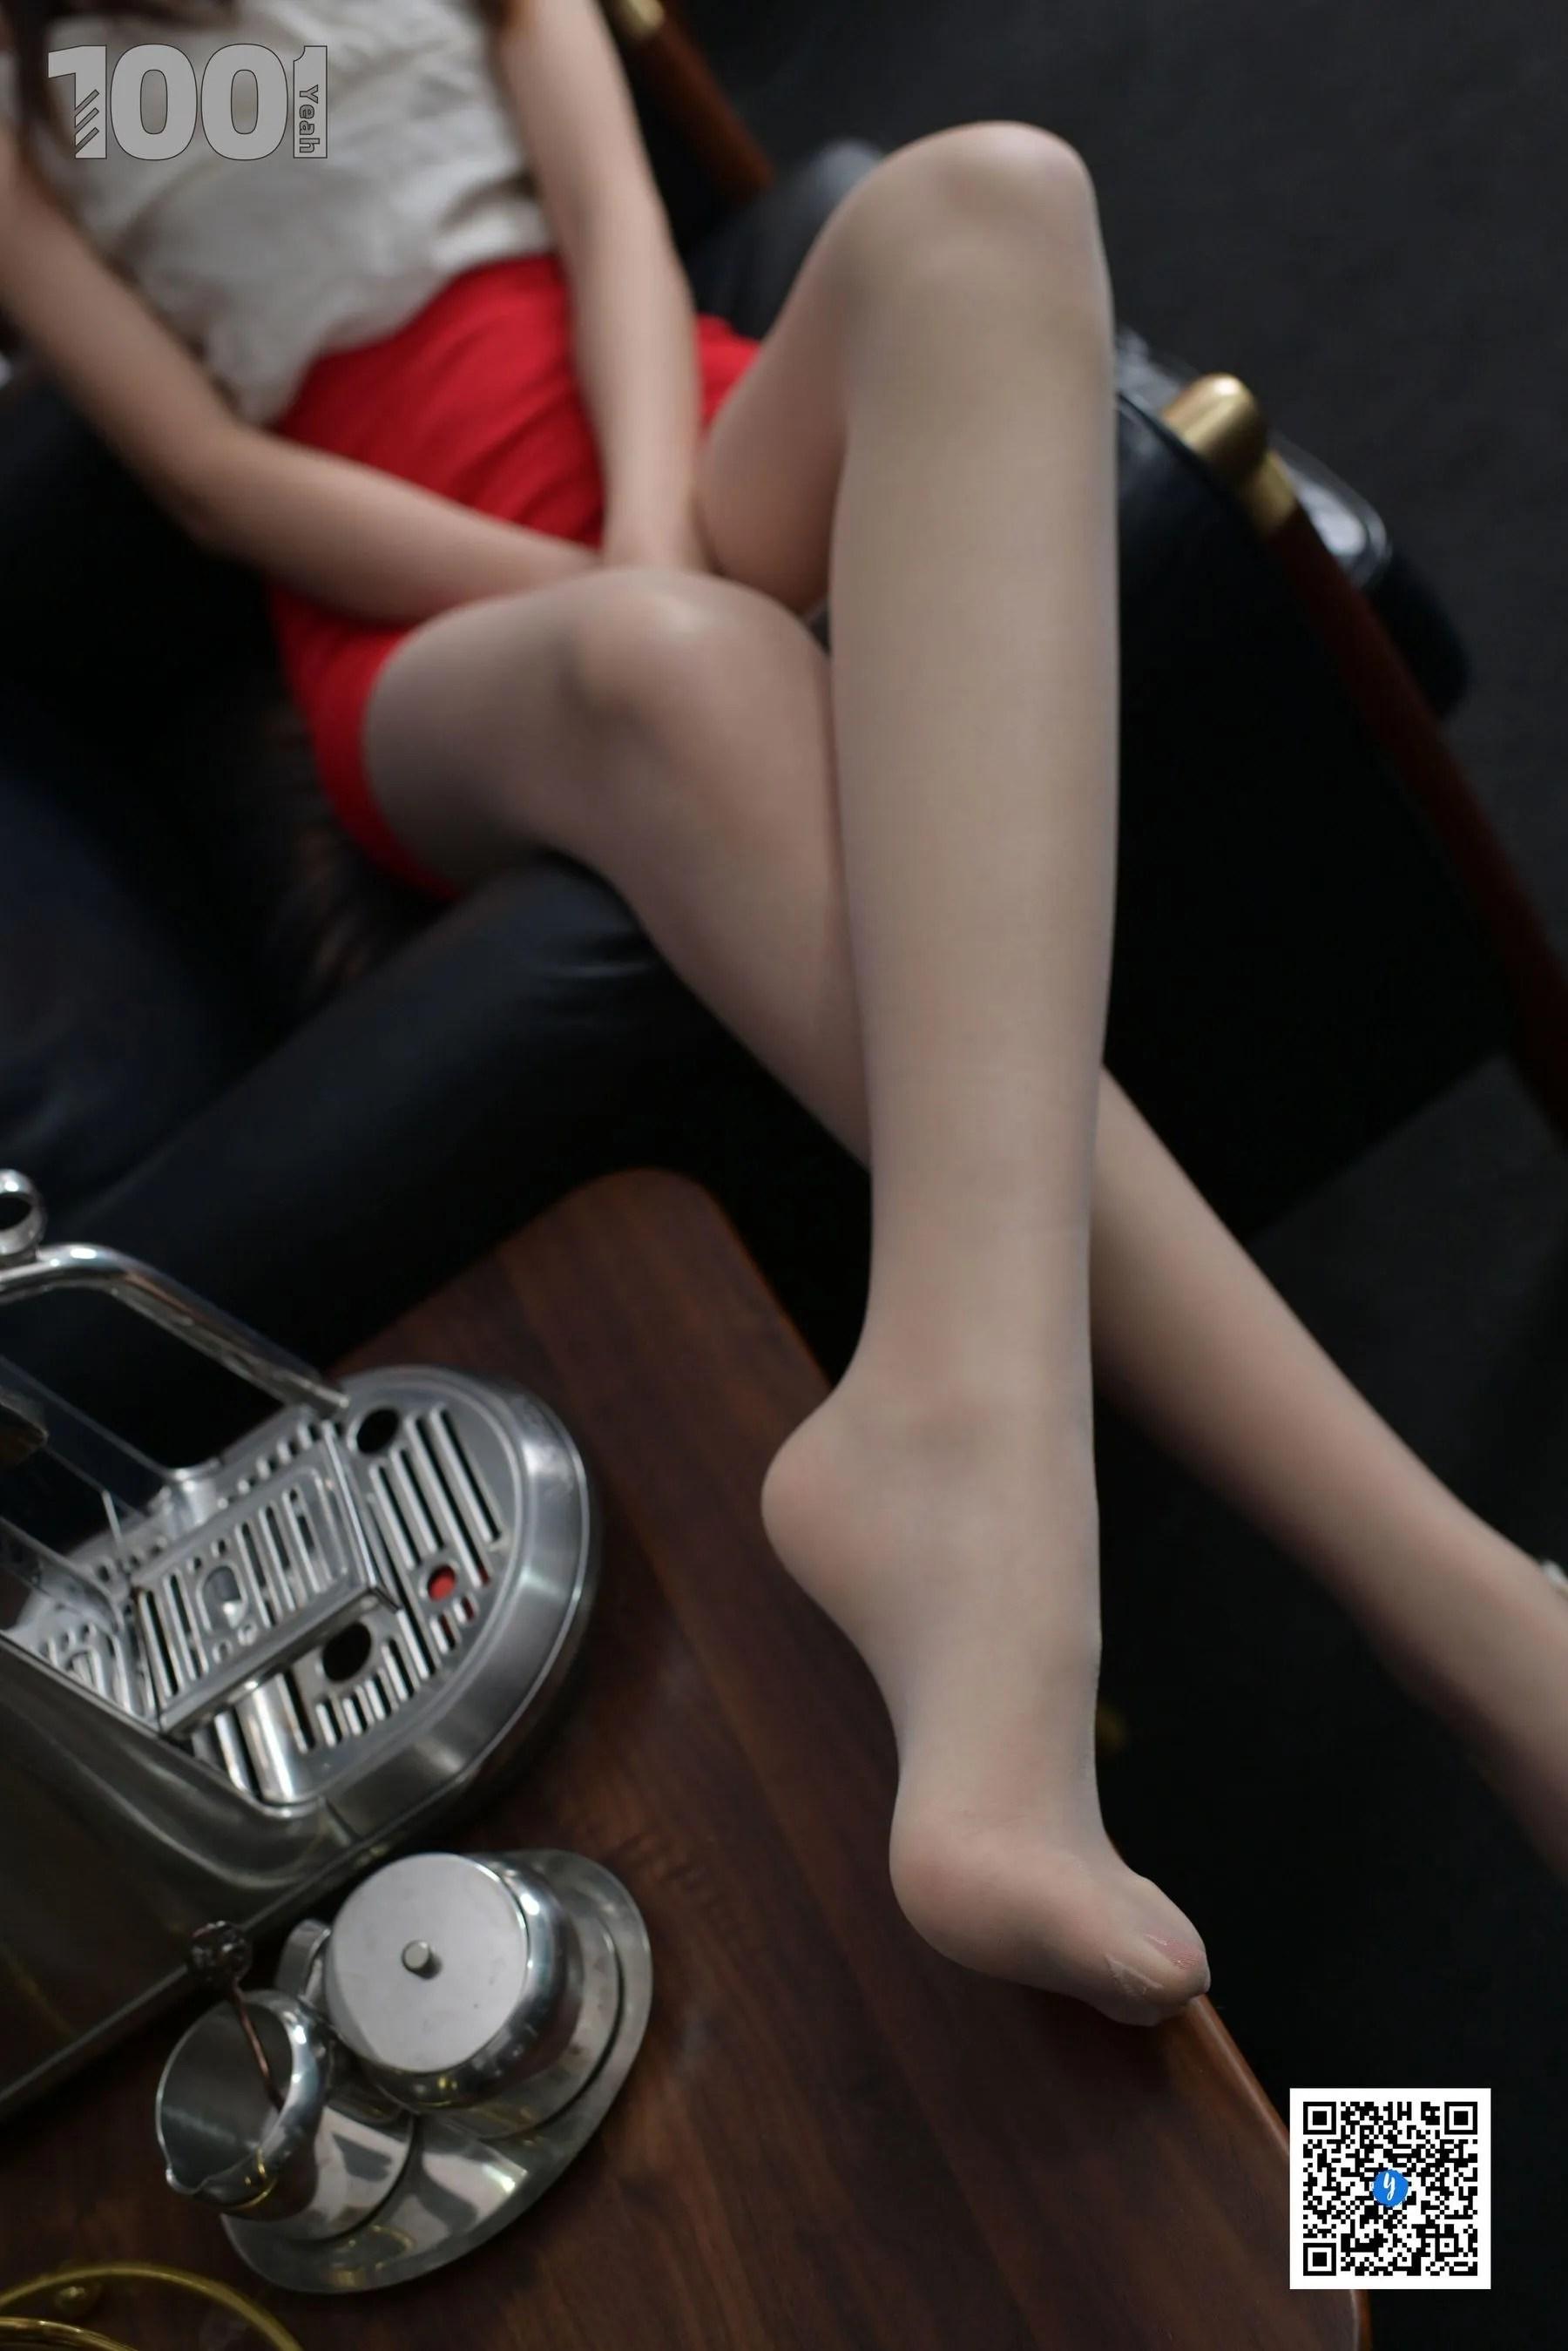 [IESS] NO.188 【一抹红2】 丝足美腿写真[90P]插图(10)